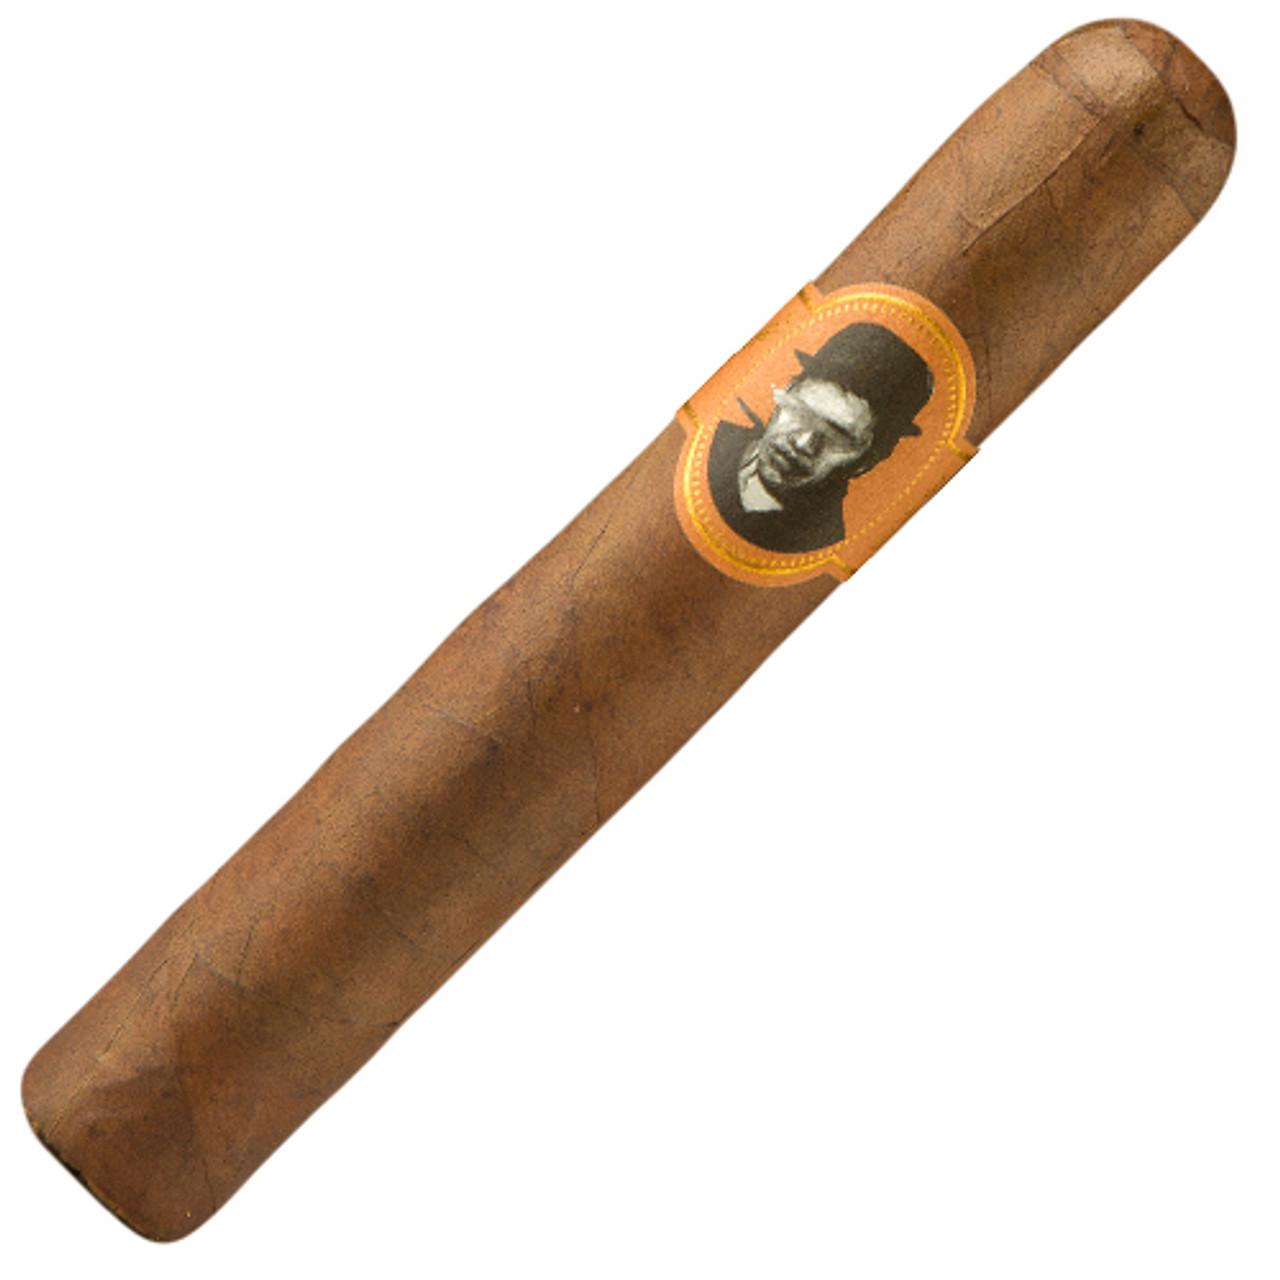 Blind Man's Bluff by Caldwell Cigar Co. Magnum Cigars - 6.5 x 52 (Box of 20)